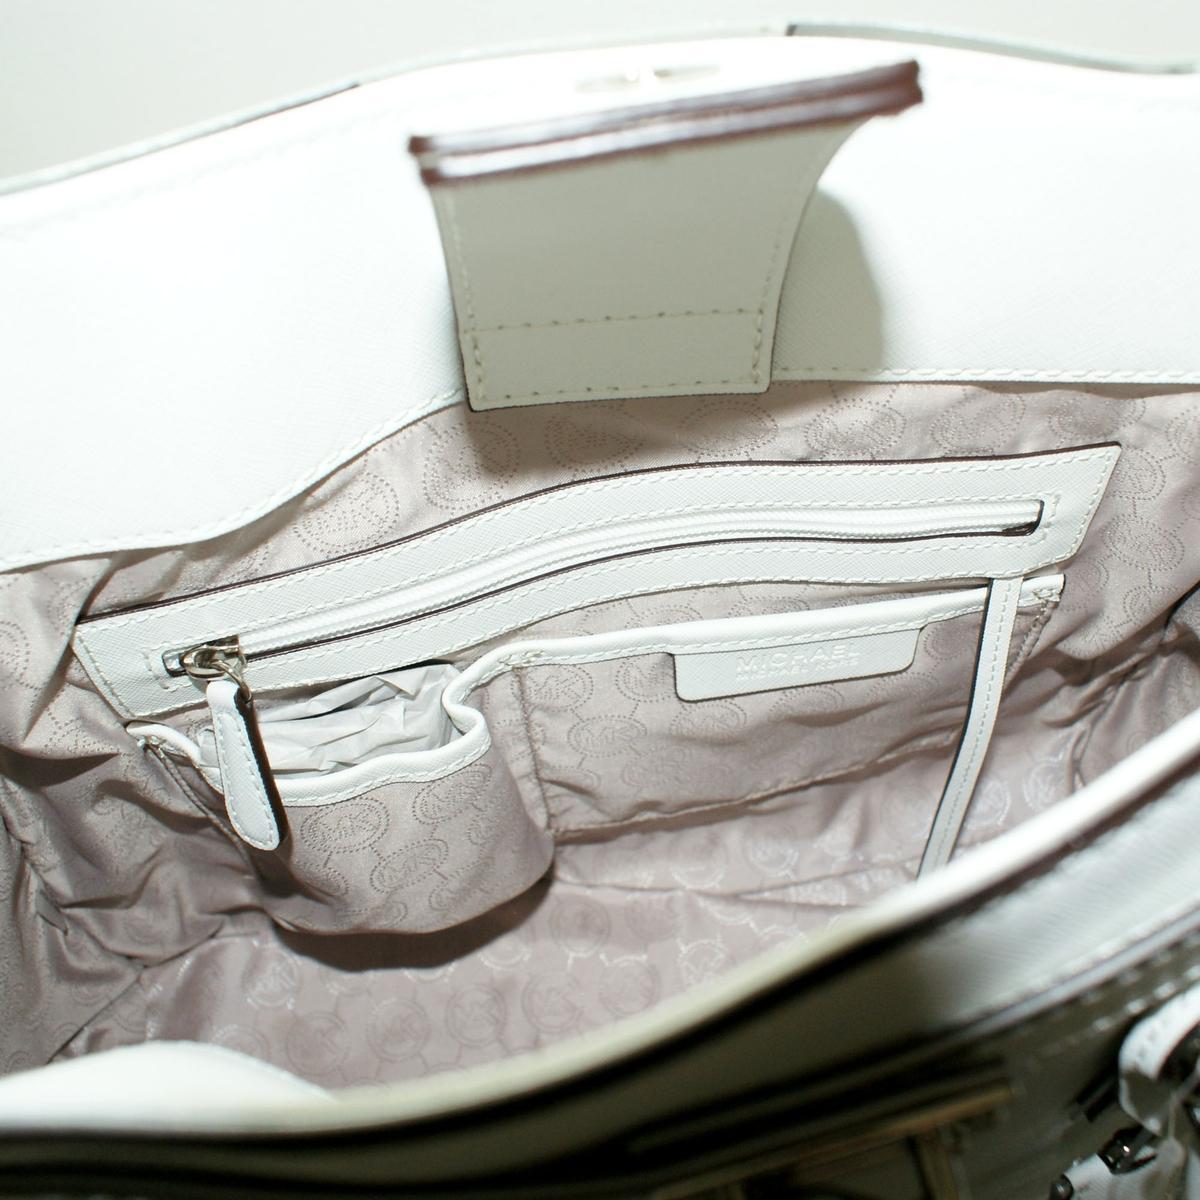 Michael kors hamilton specchio large genuine leather tote for Lots specchio